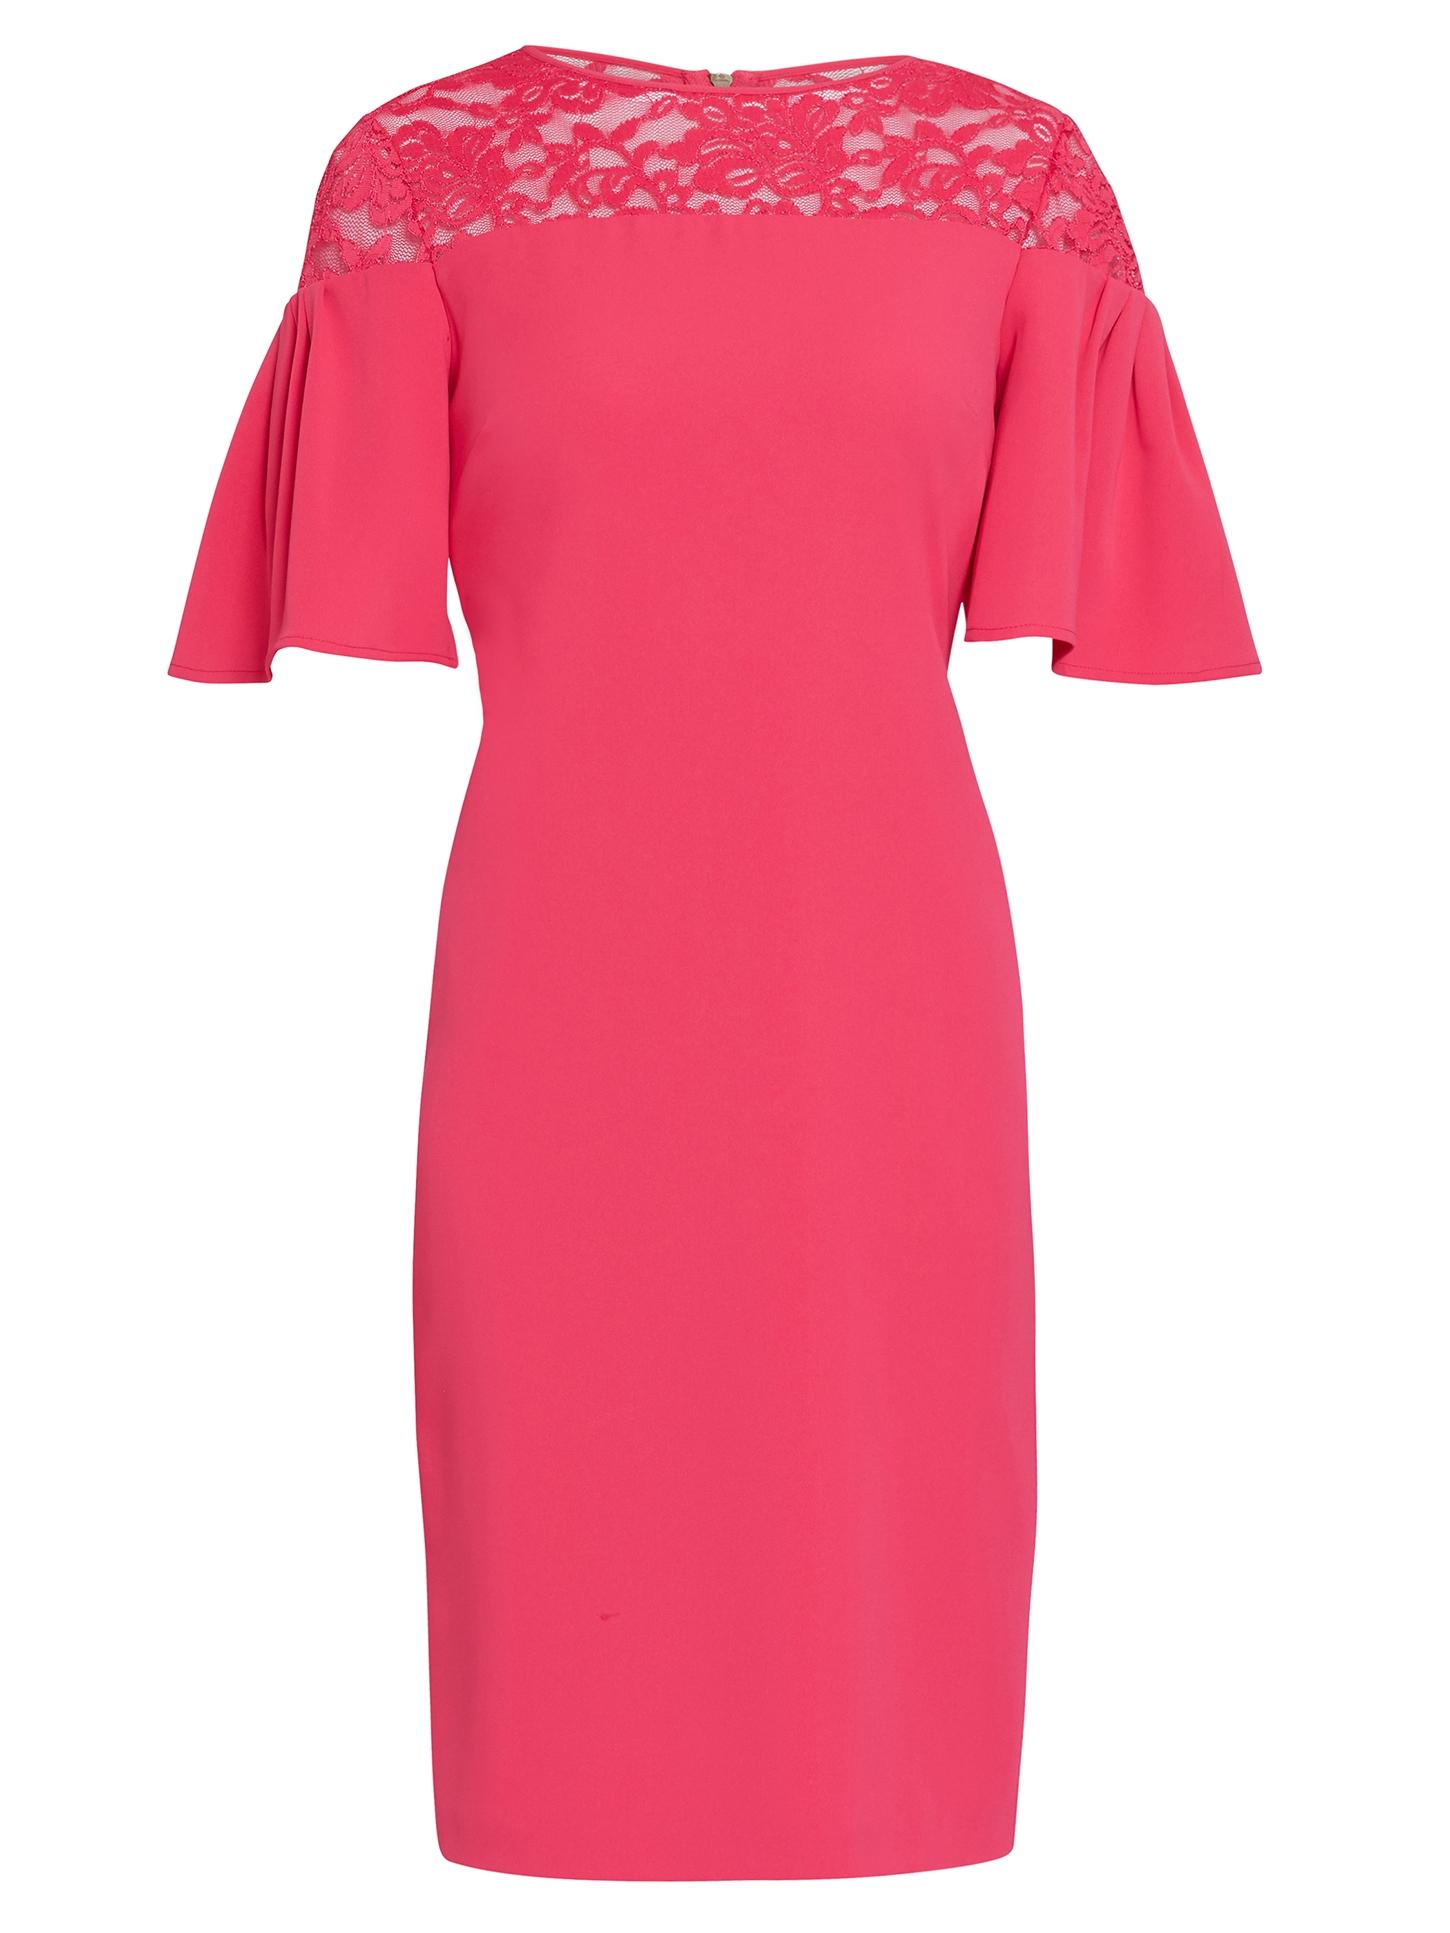 Boriana Moss Crepe Dress